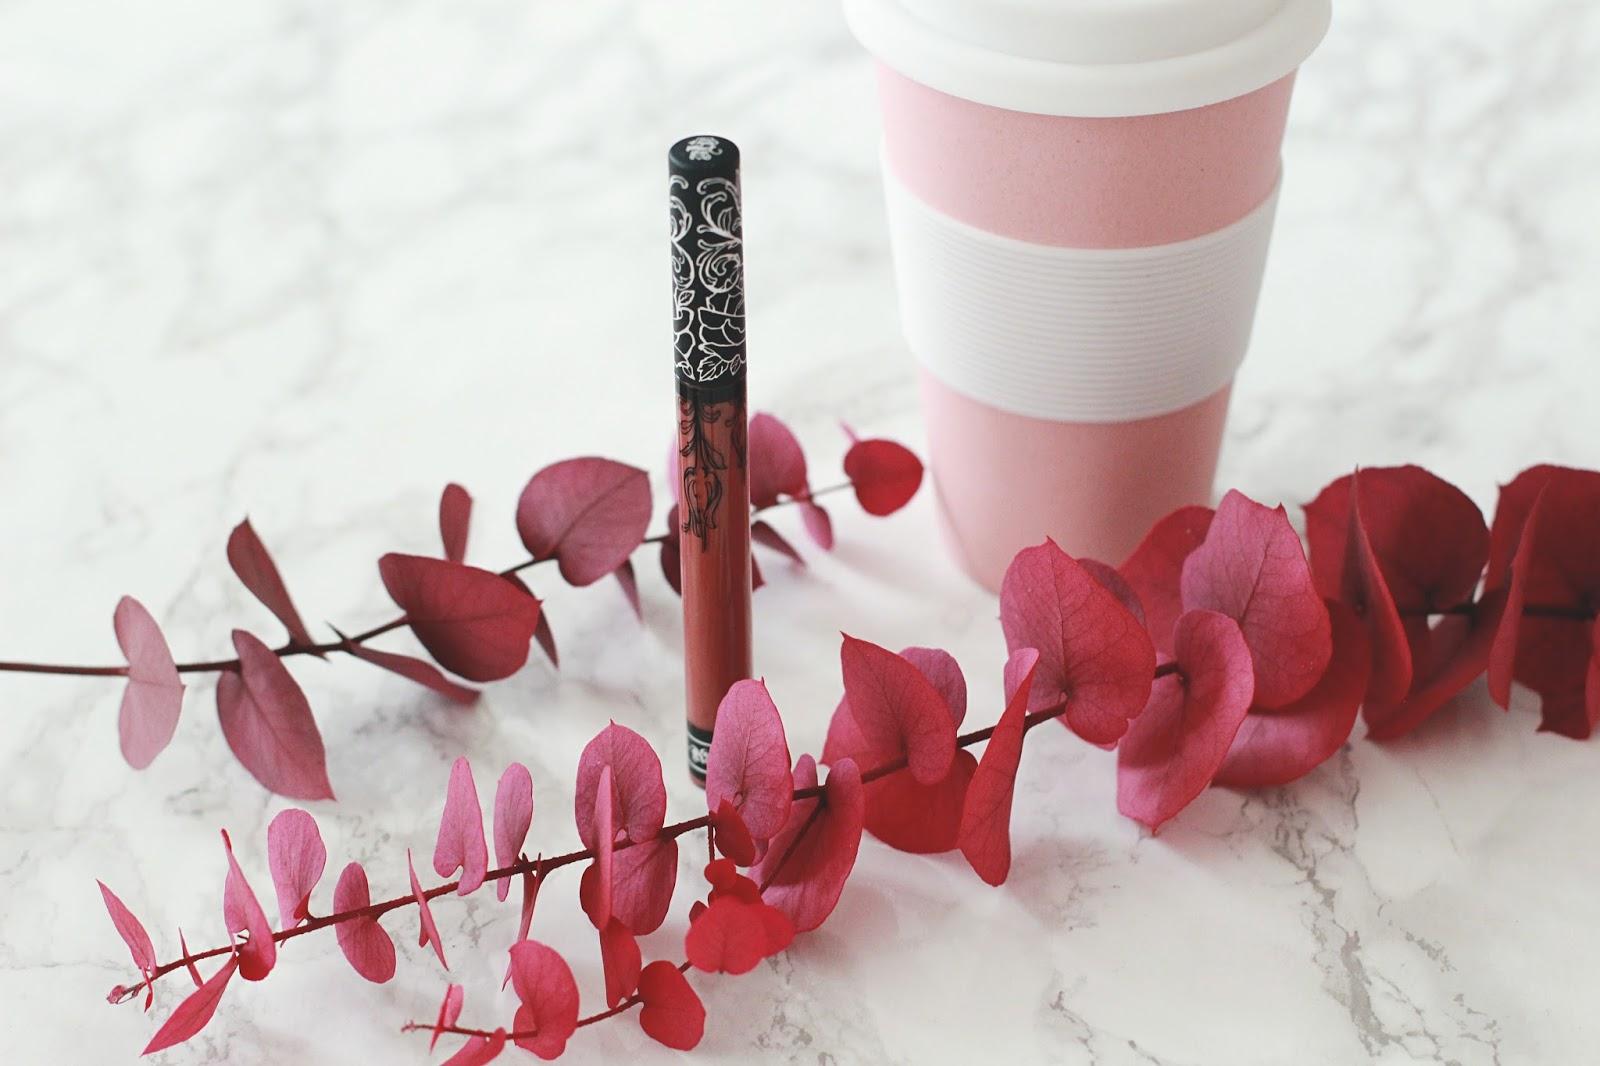 Everlasting Liquid Lisptick Kat Von D teinte Lolita